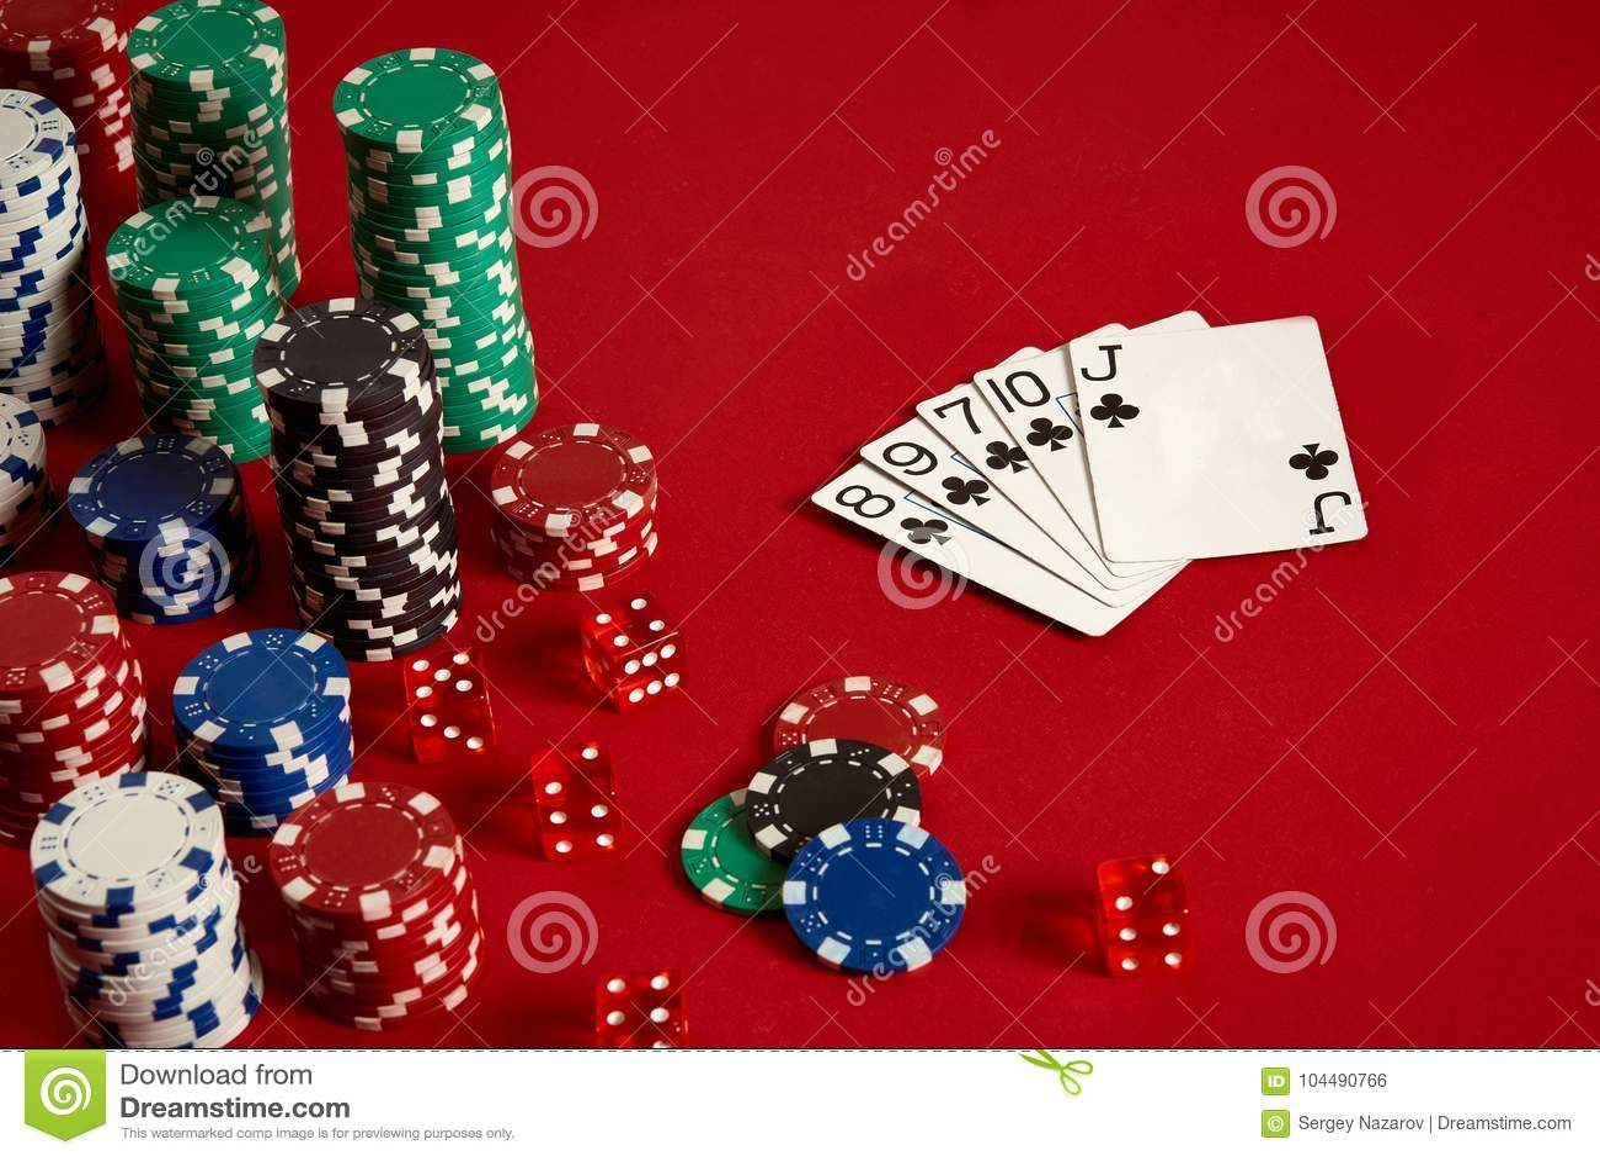 �гра казино рояль гта